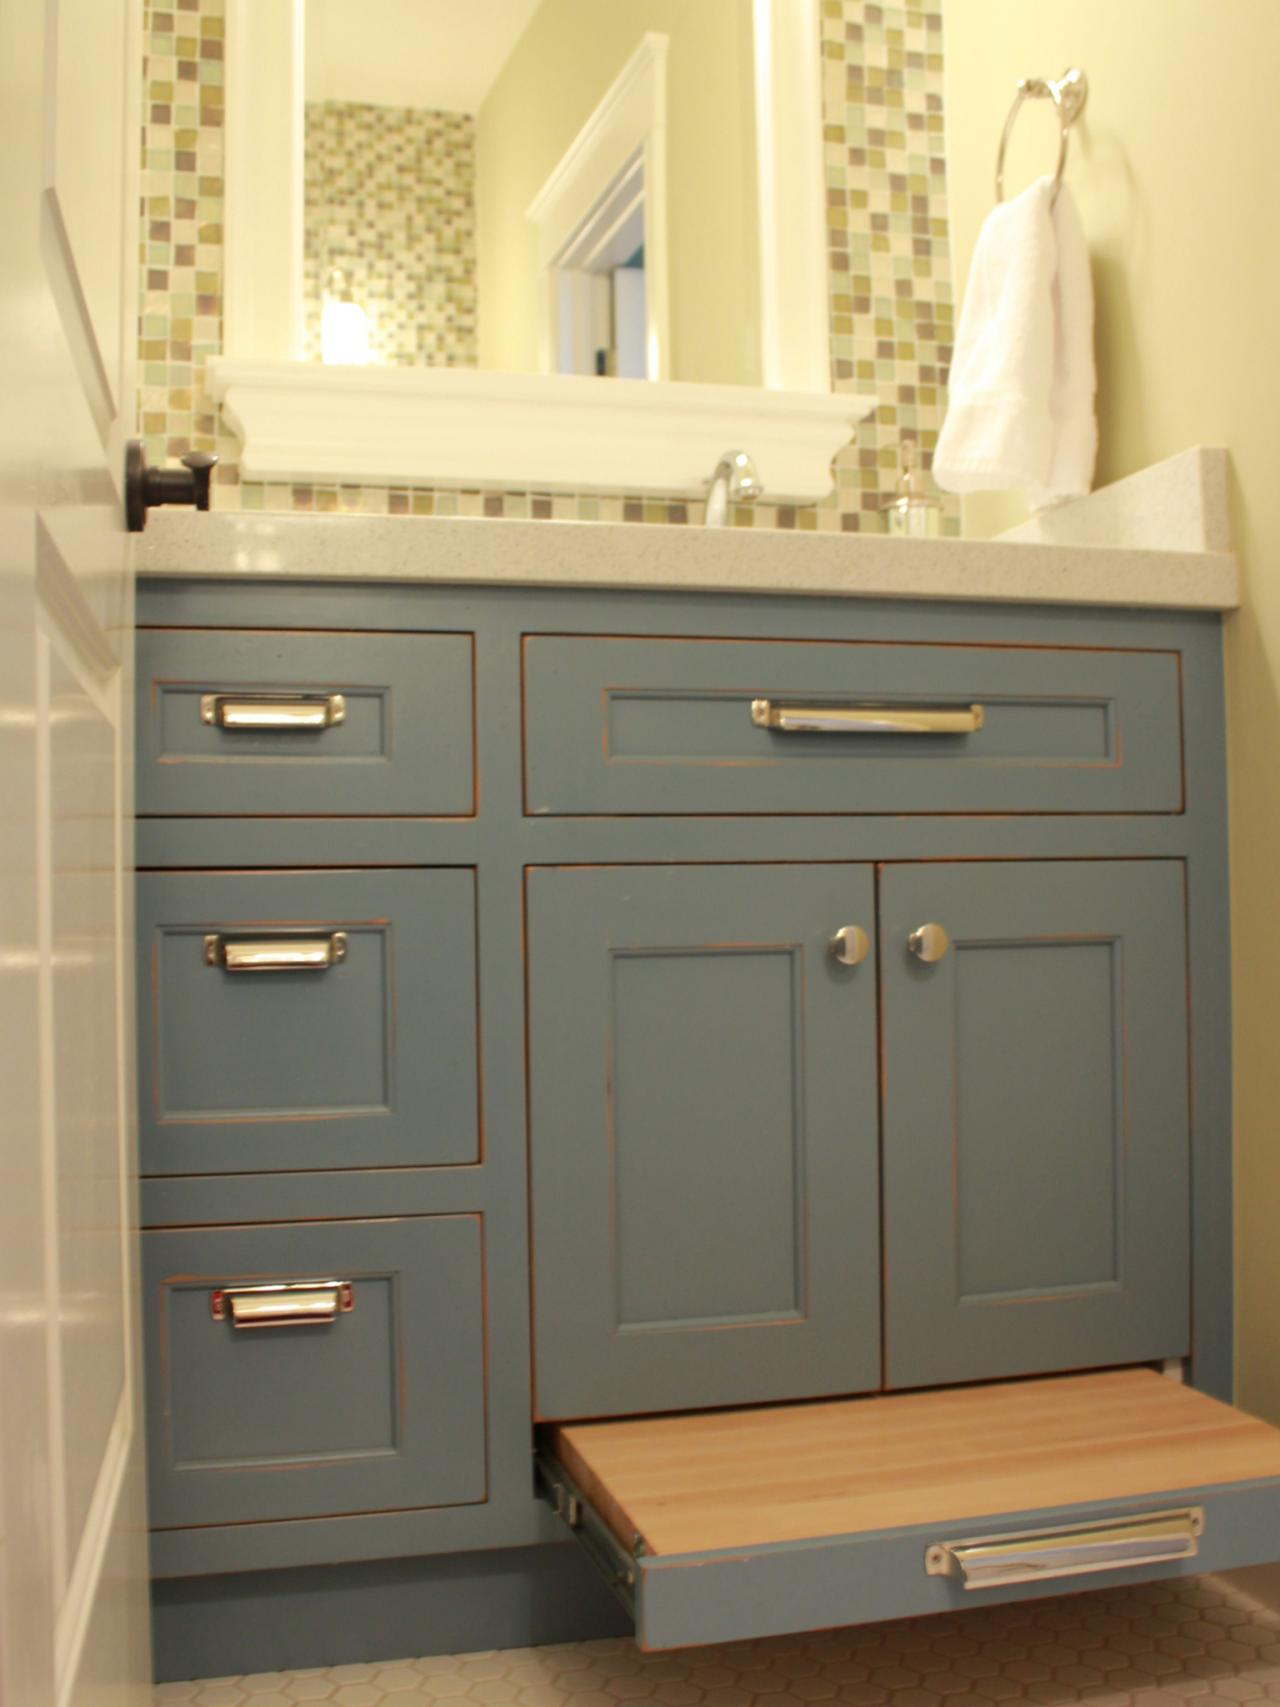 Petite Practical country style vanities for bathroom Astonishing New